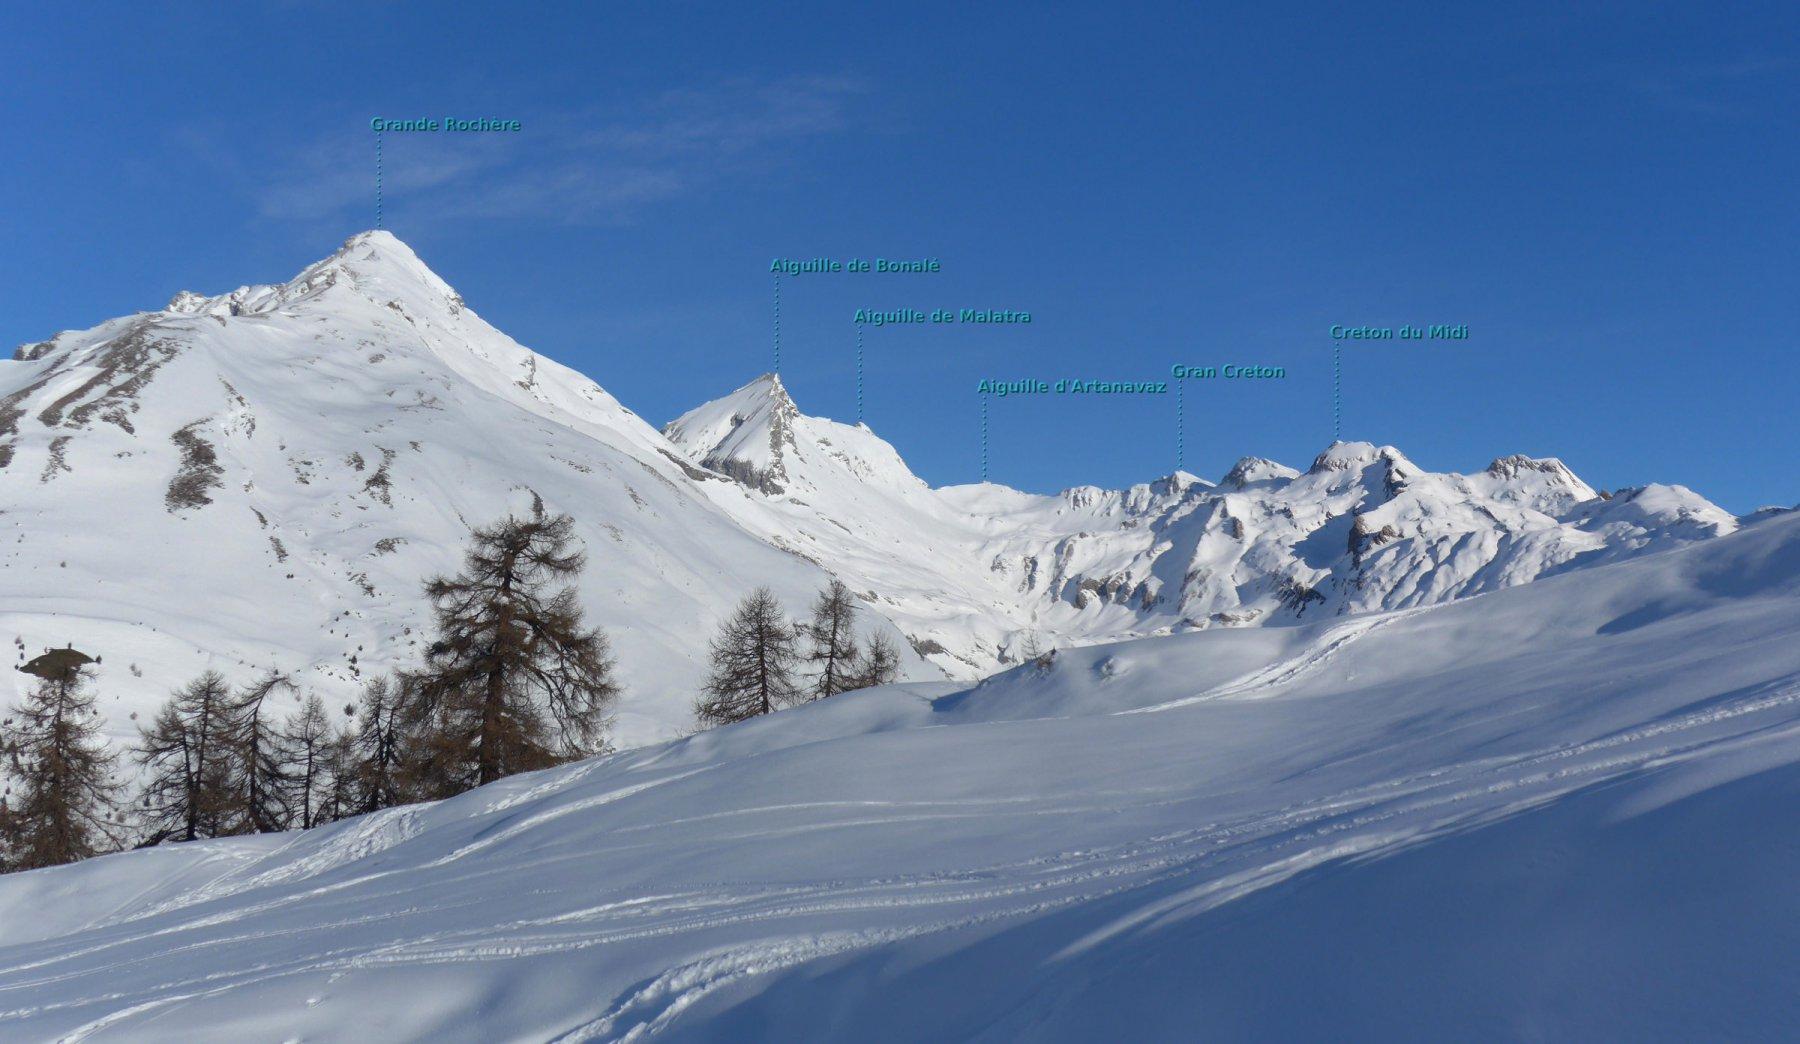 panoramica sul vallone d'Artanavaz